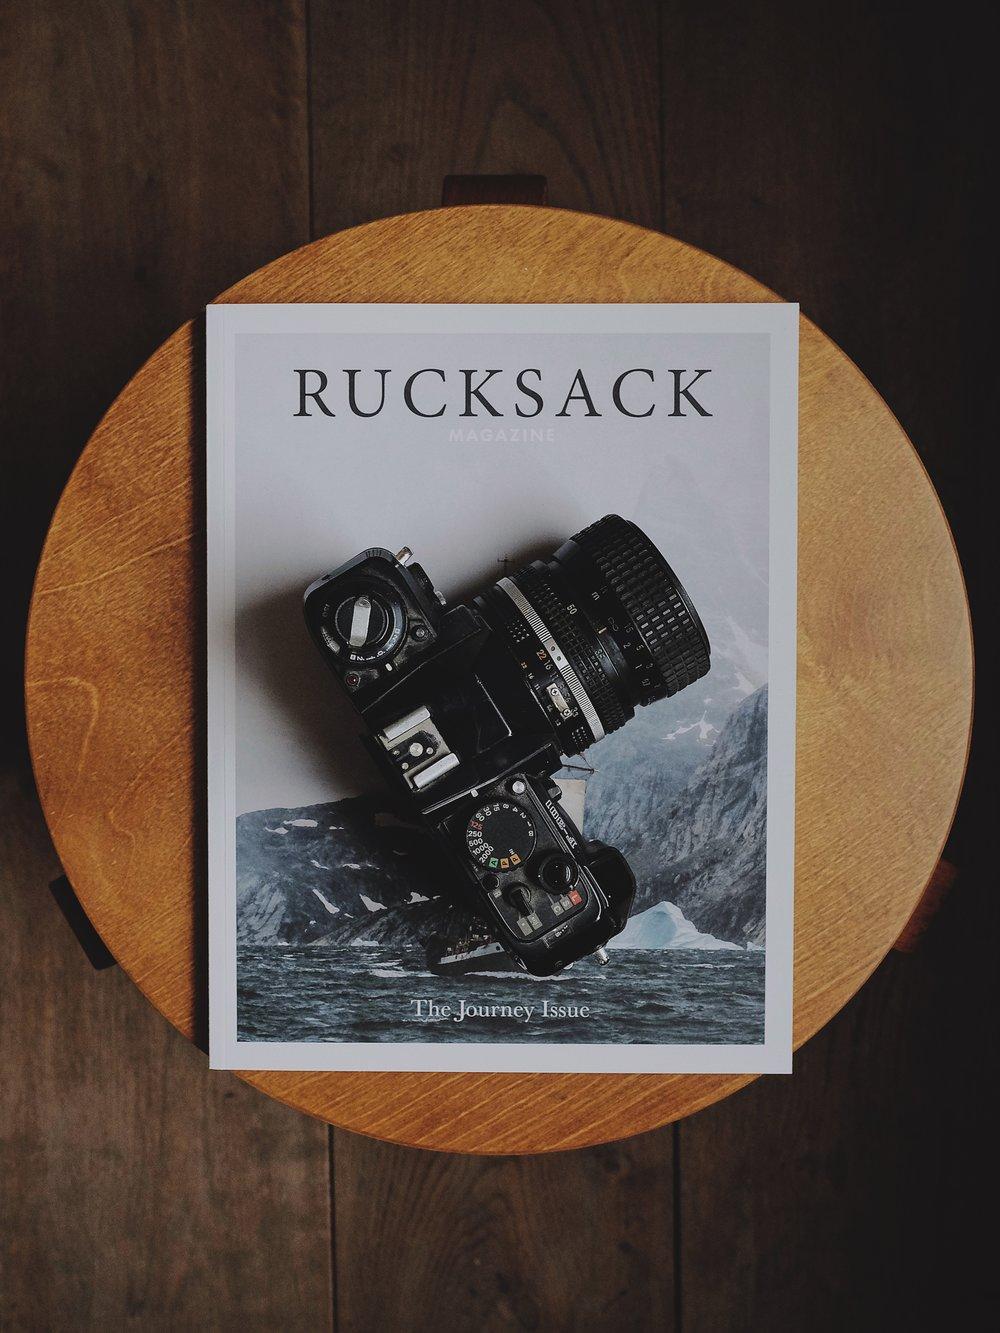 rucksack-magazine-603895-unsplash.jpg